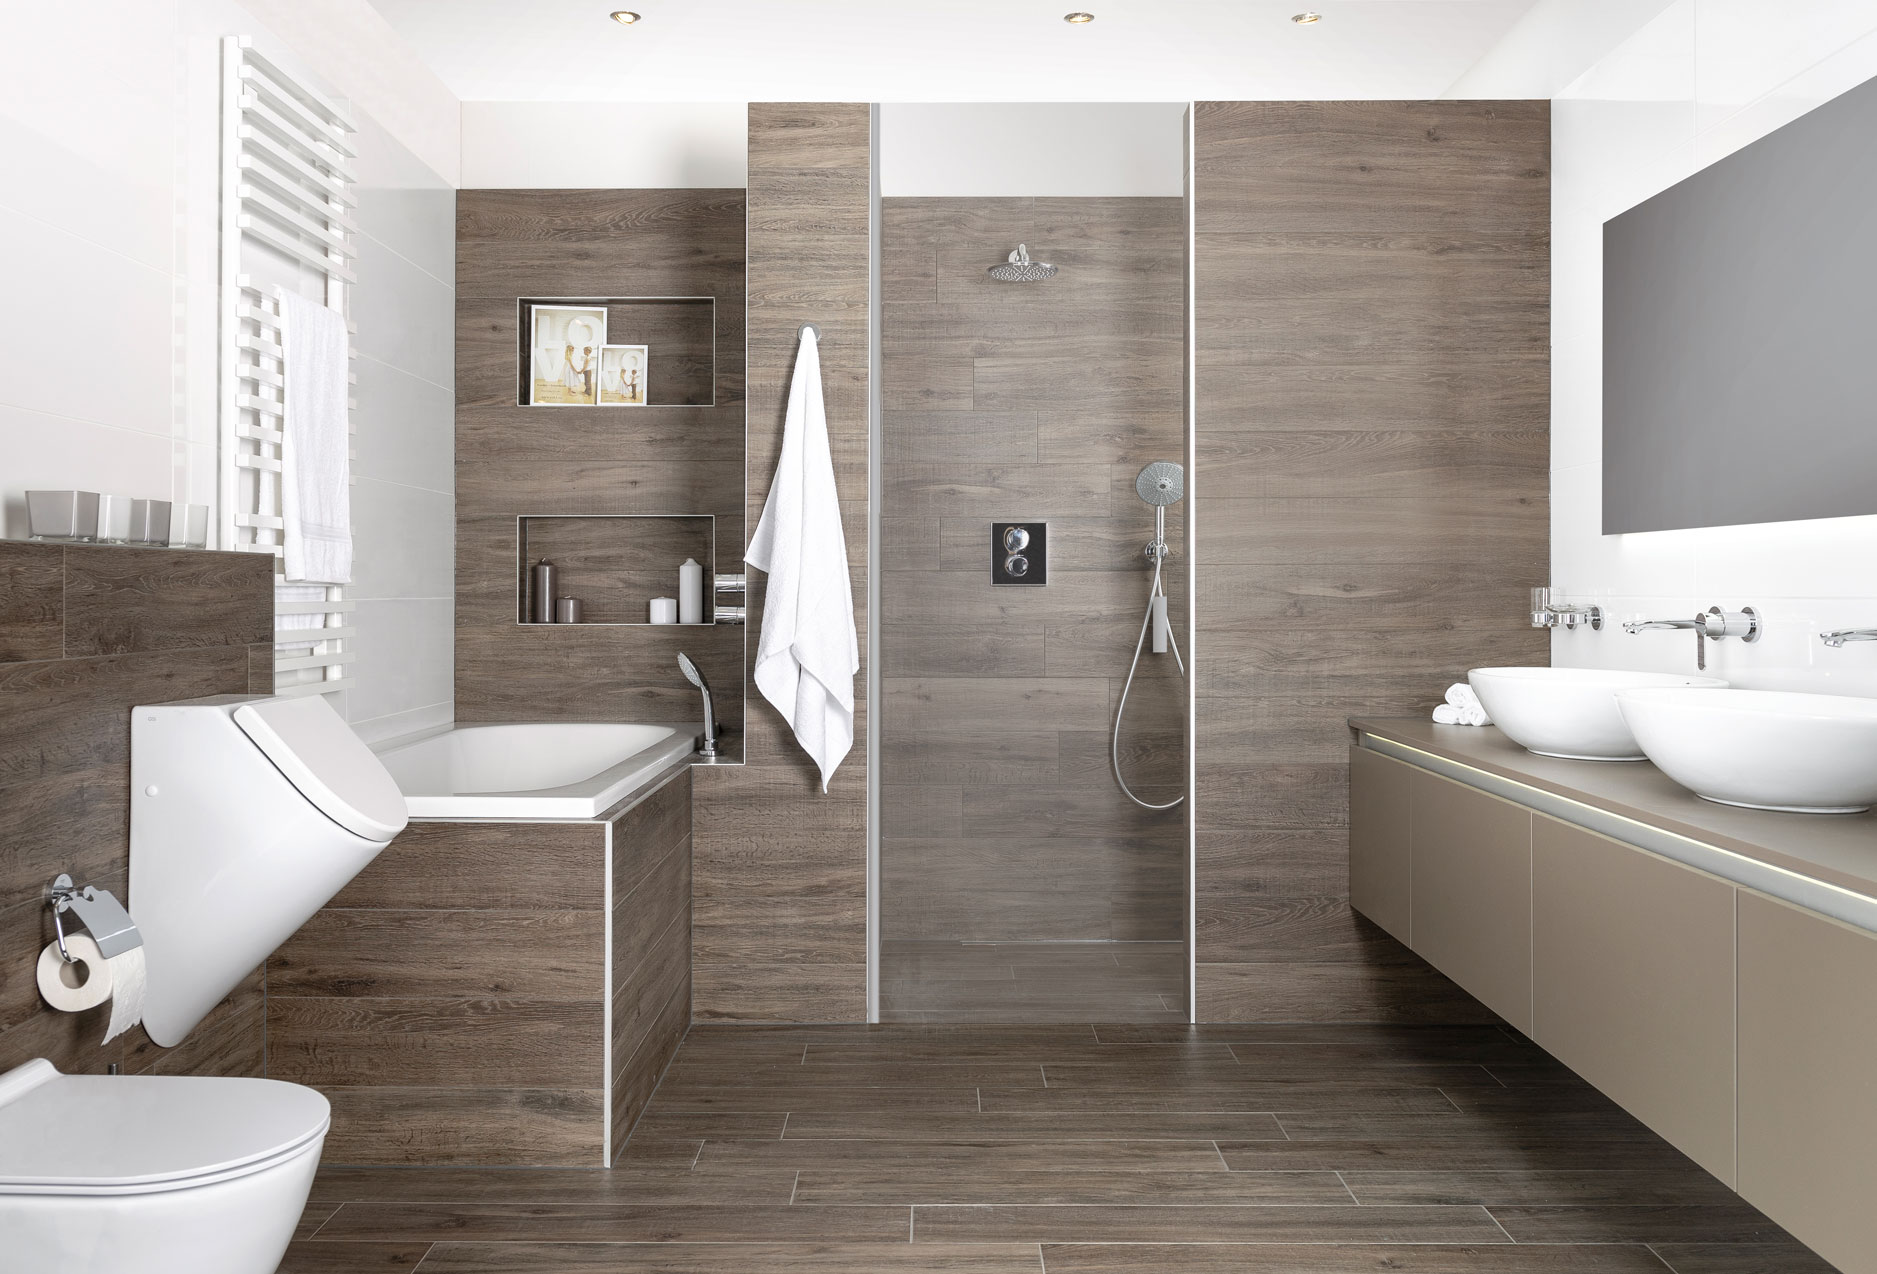 Hammam Badkamer Ideeen : Hammam badkamer ideeen latest geweldig hammam badkamer ideeen